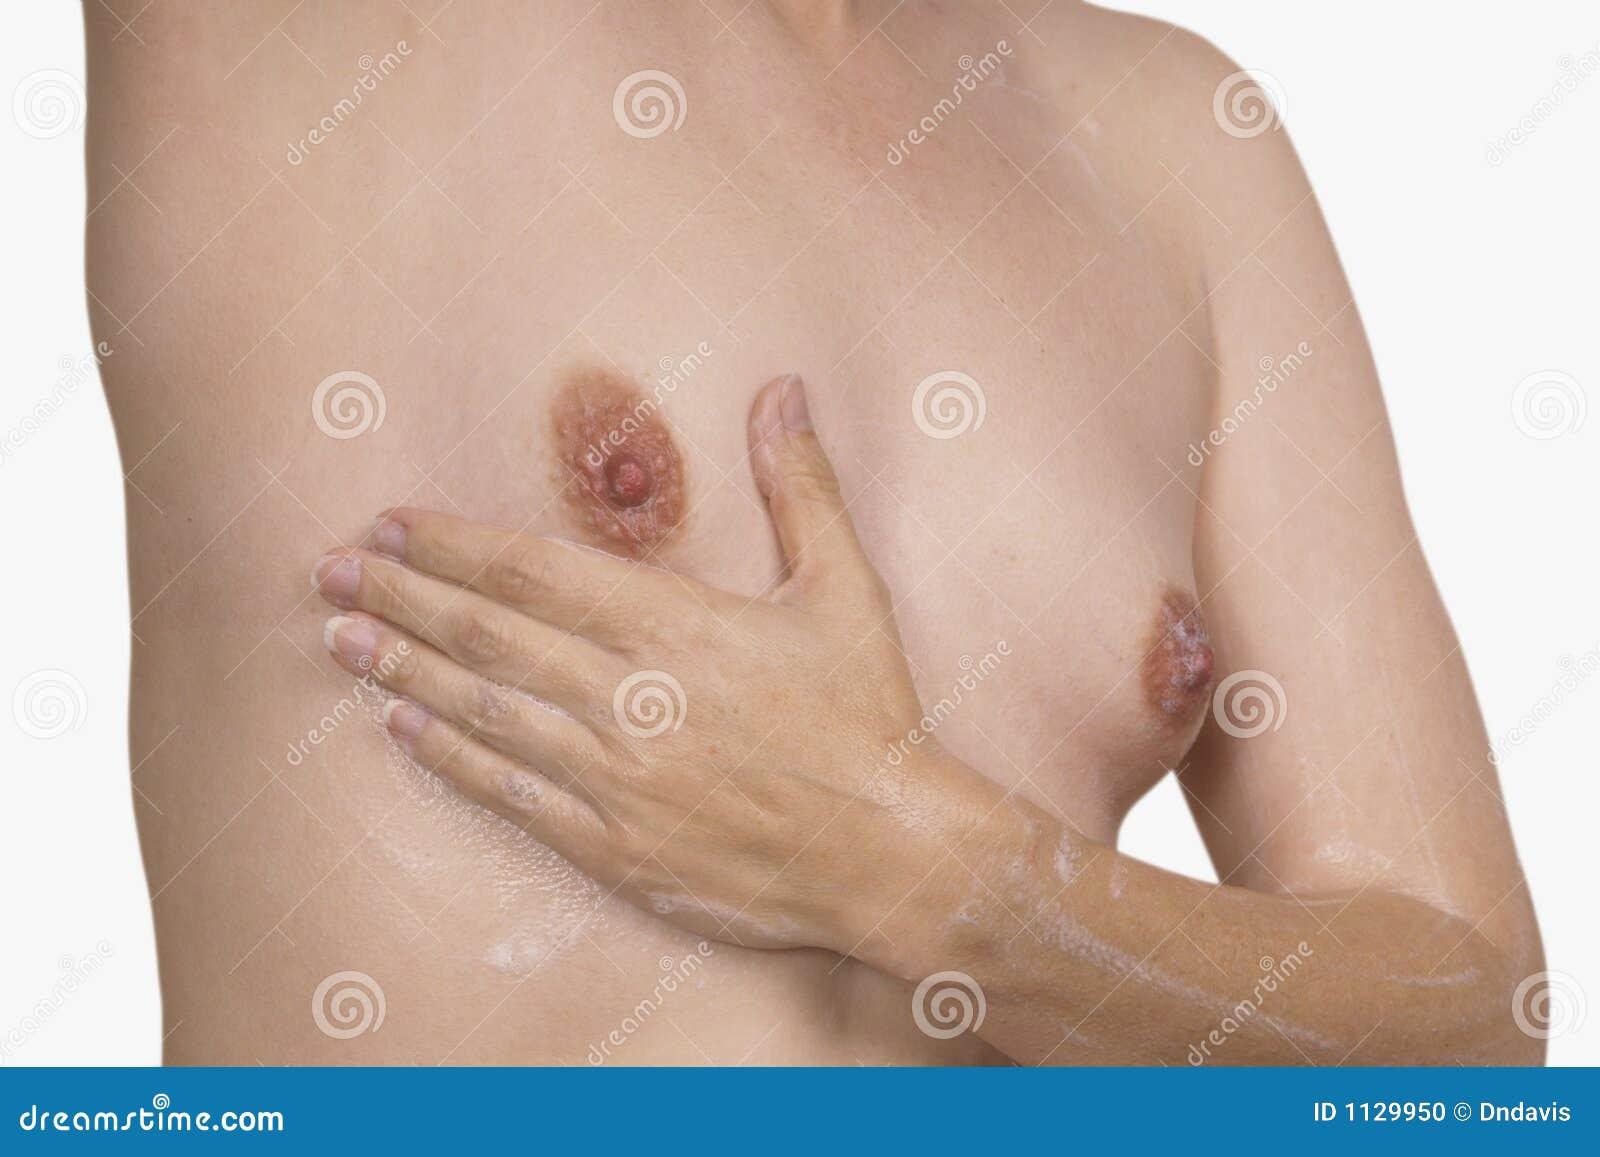 Lori davis breast exam